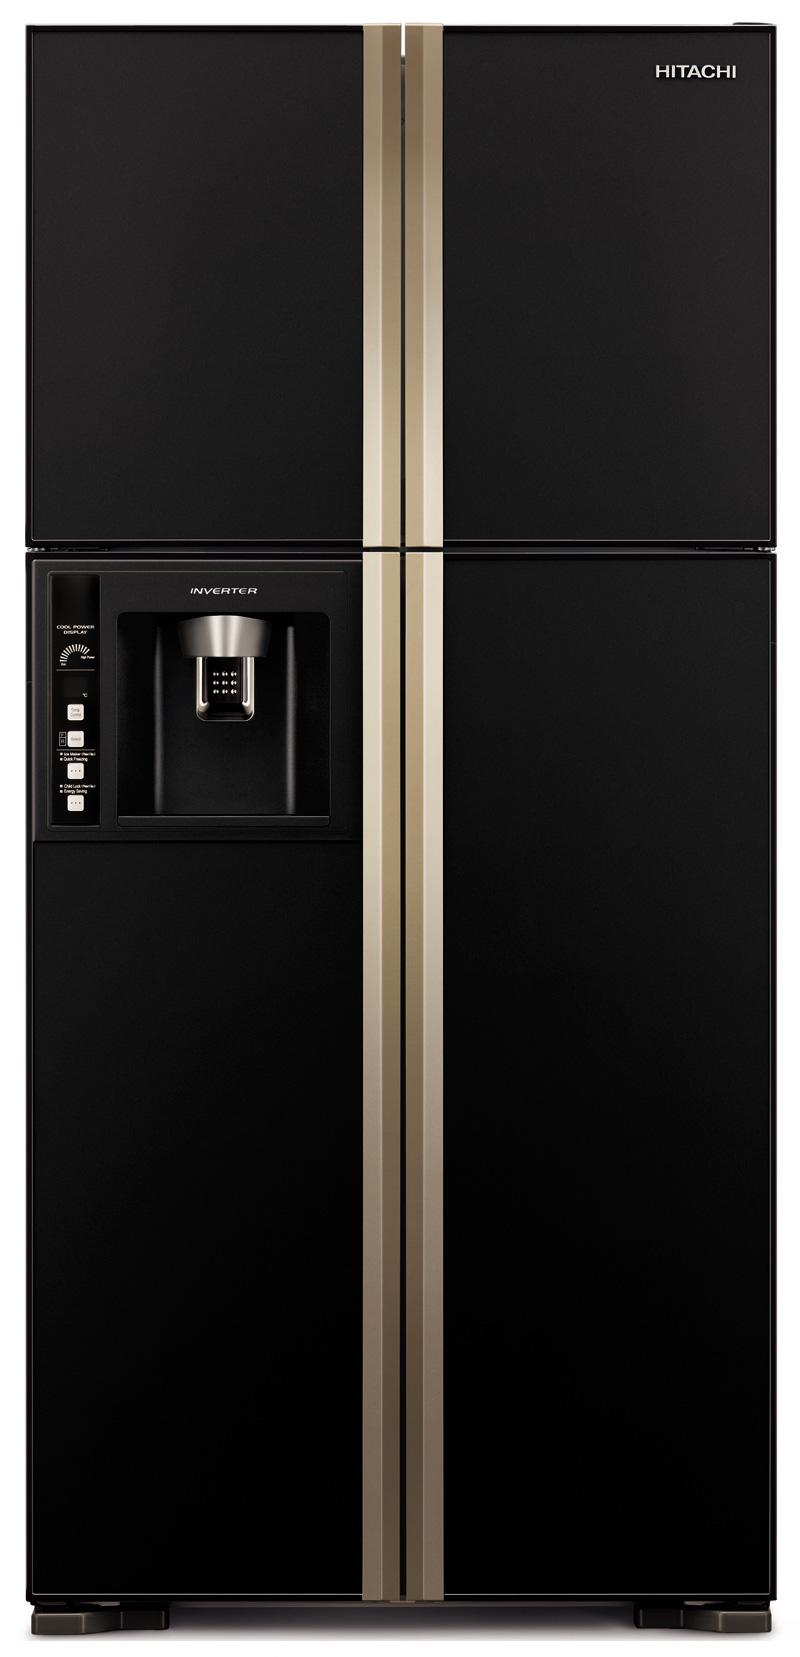 Side-By-Side Refrigerator - 582L, 2 Doors, Black      H-RW720FPG1XGBK